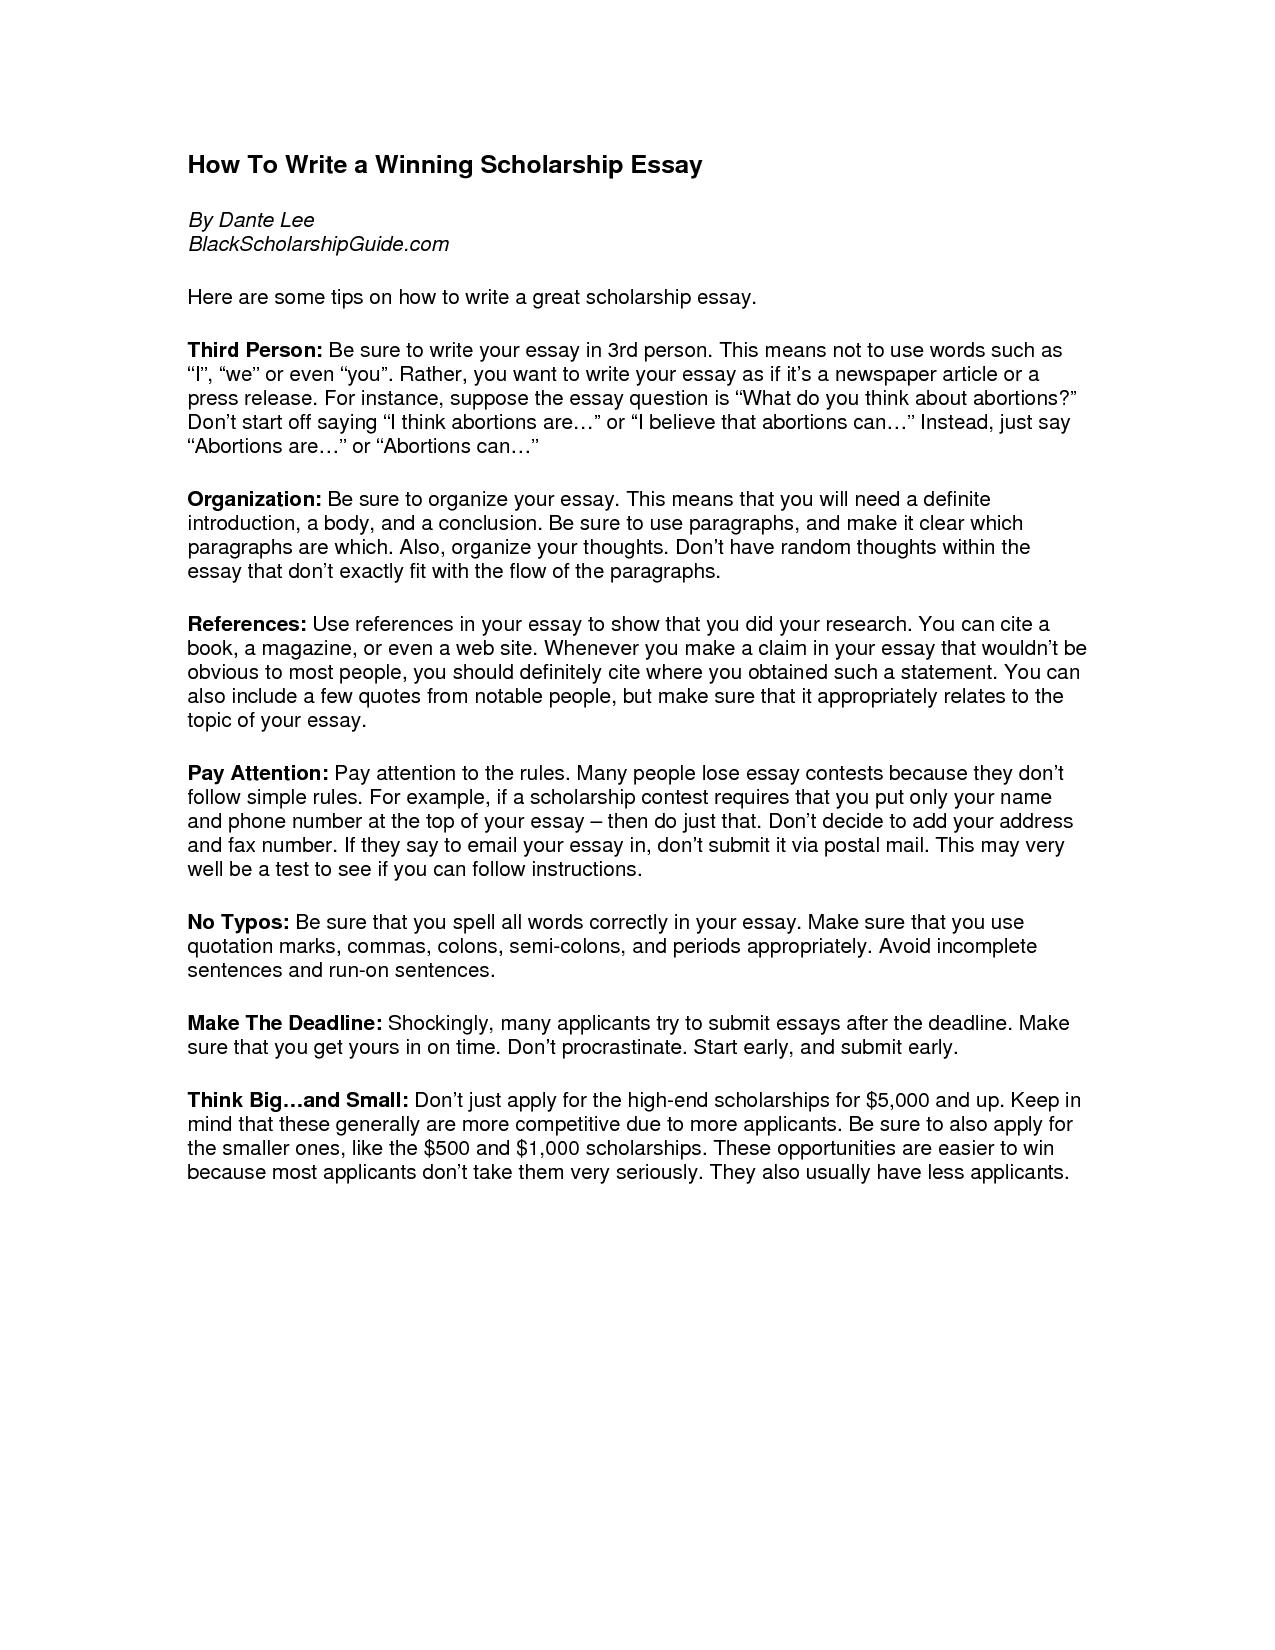 019 Help Writing Top Scholarship Essay On Lincoln The Forum Tips For Effective Essays Winning Singular Rotc Psc Reddit Full